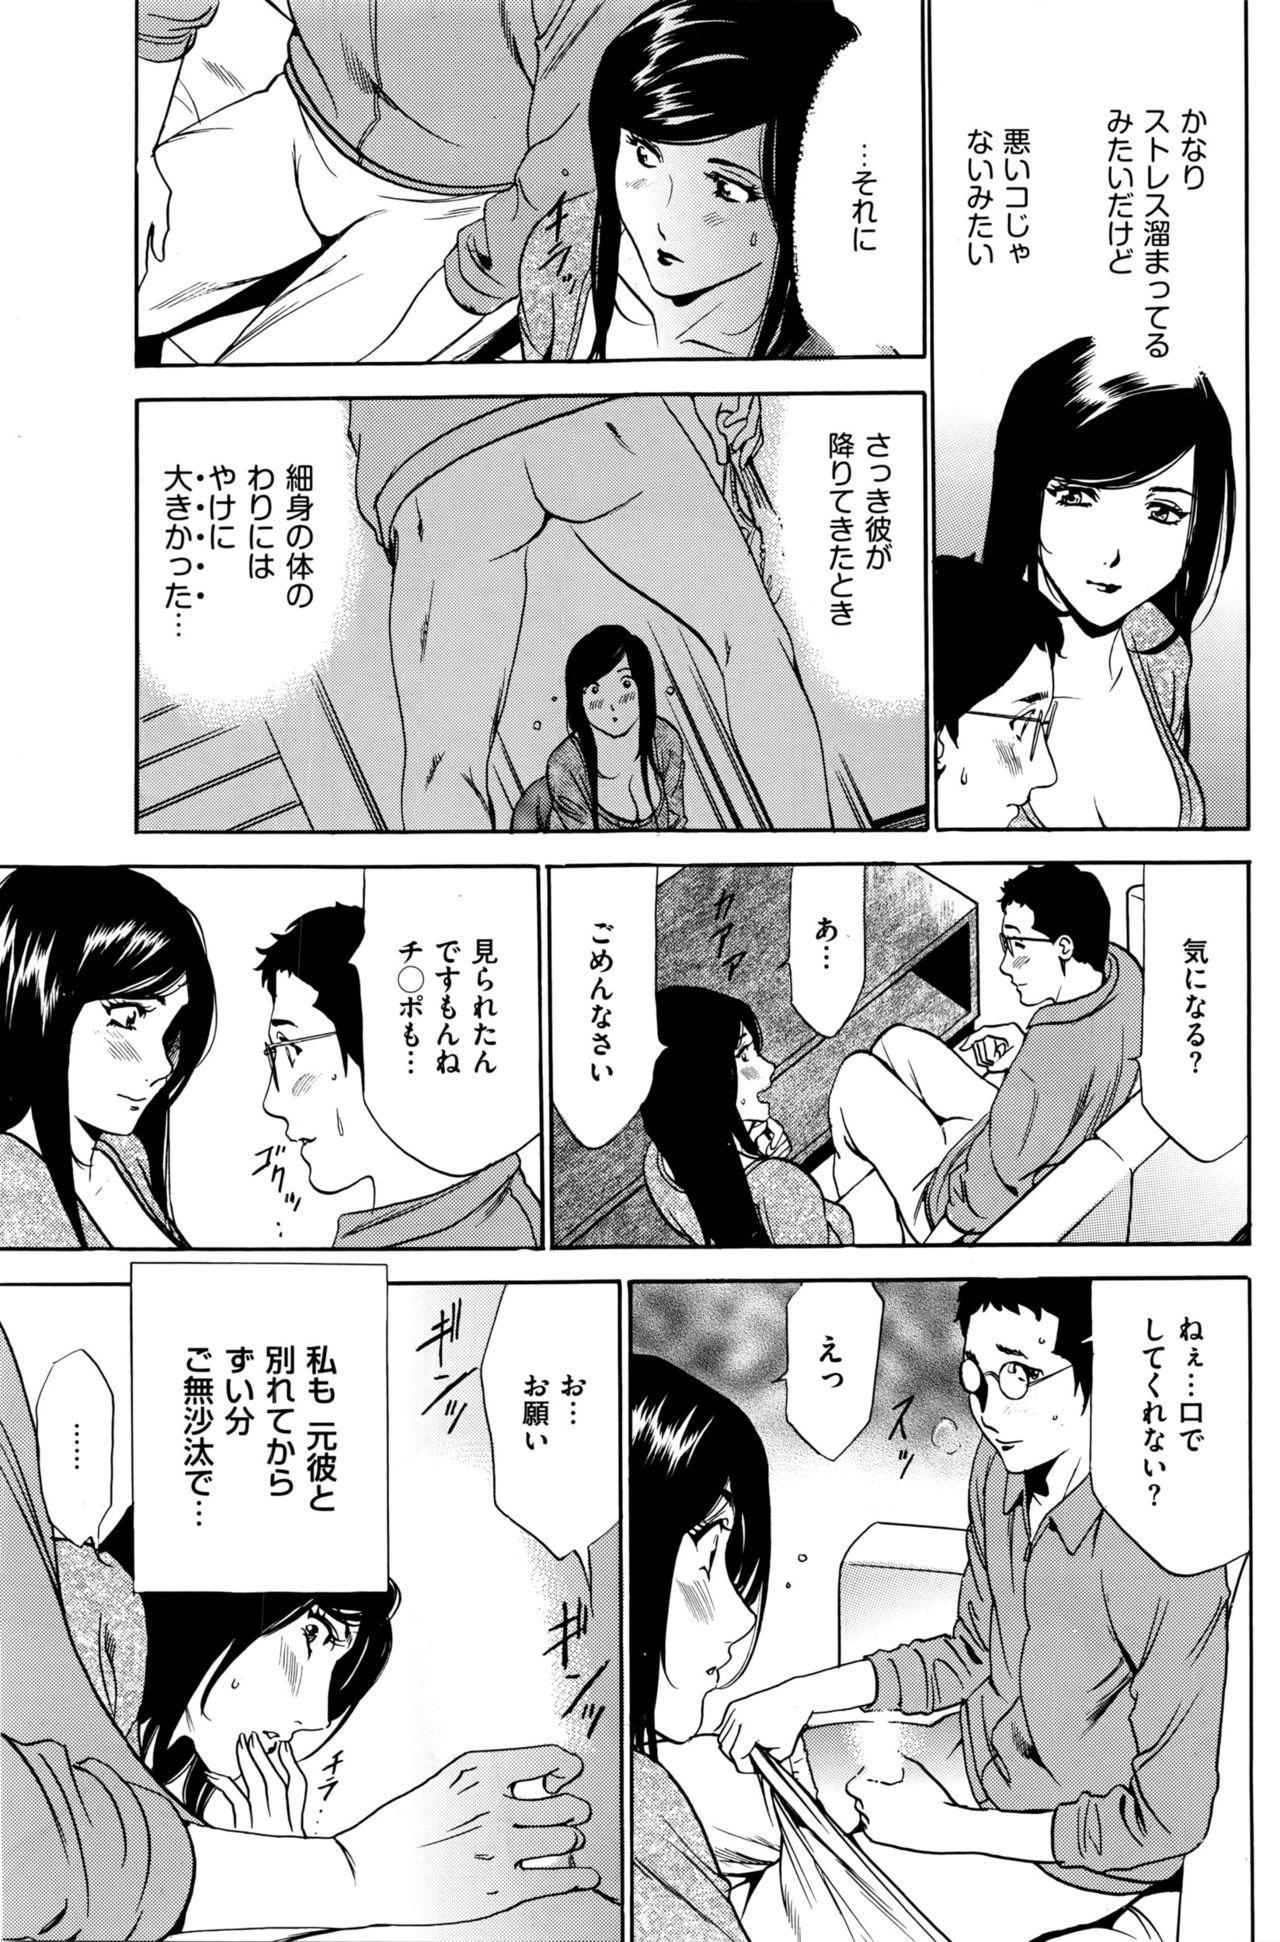 Wa Usuki Ipa a 1-10 27